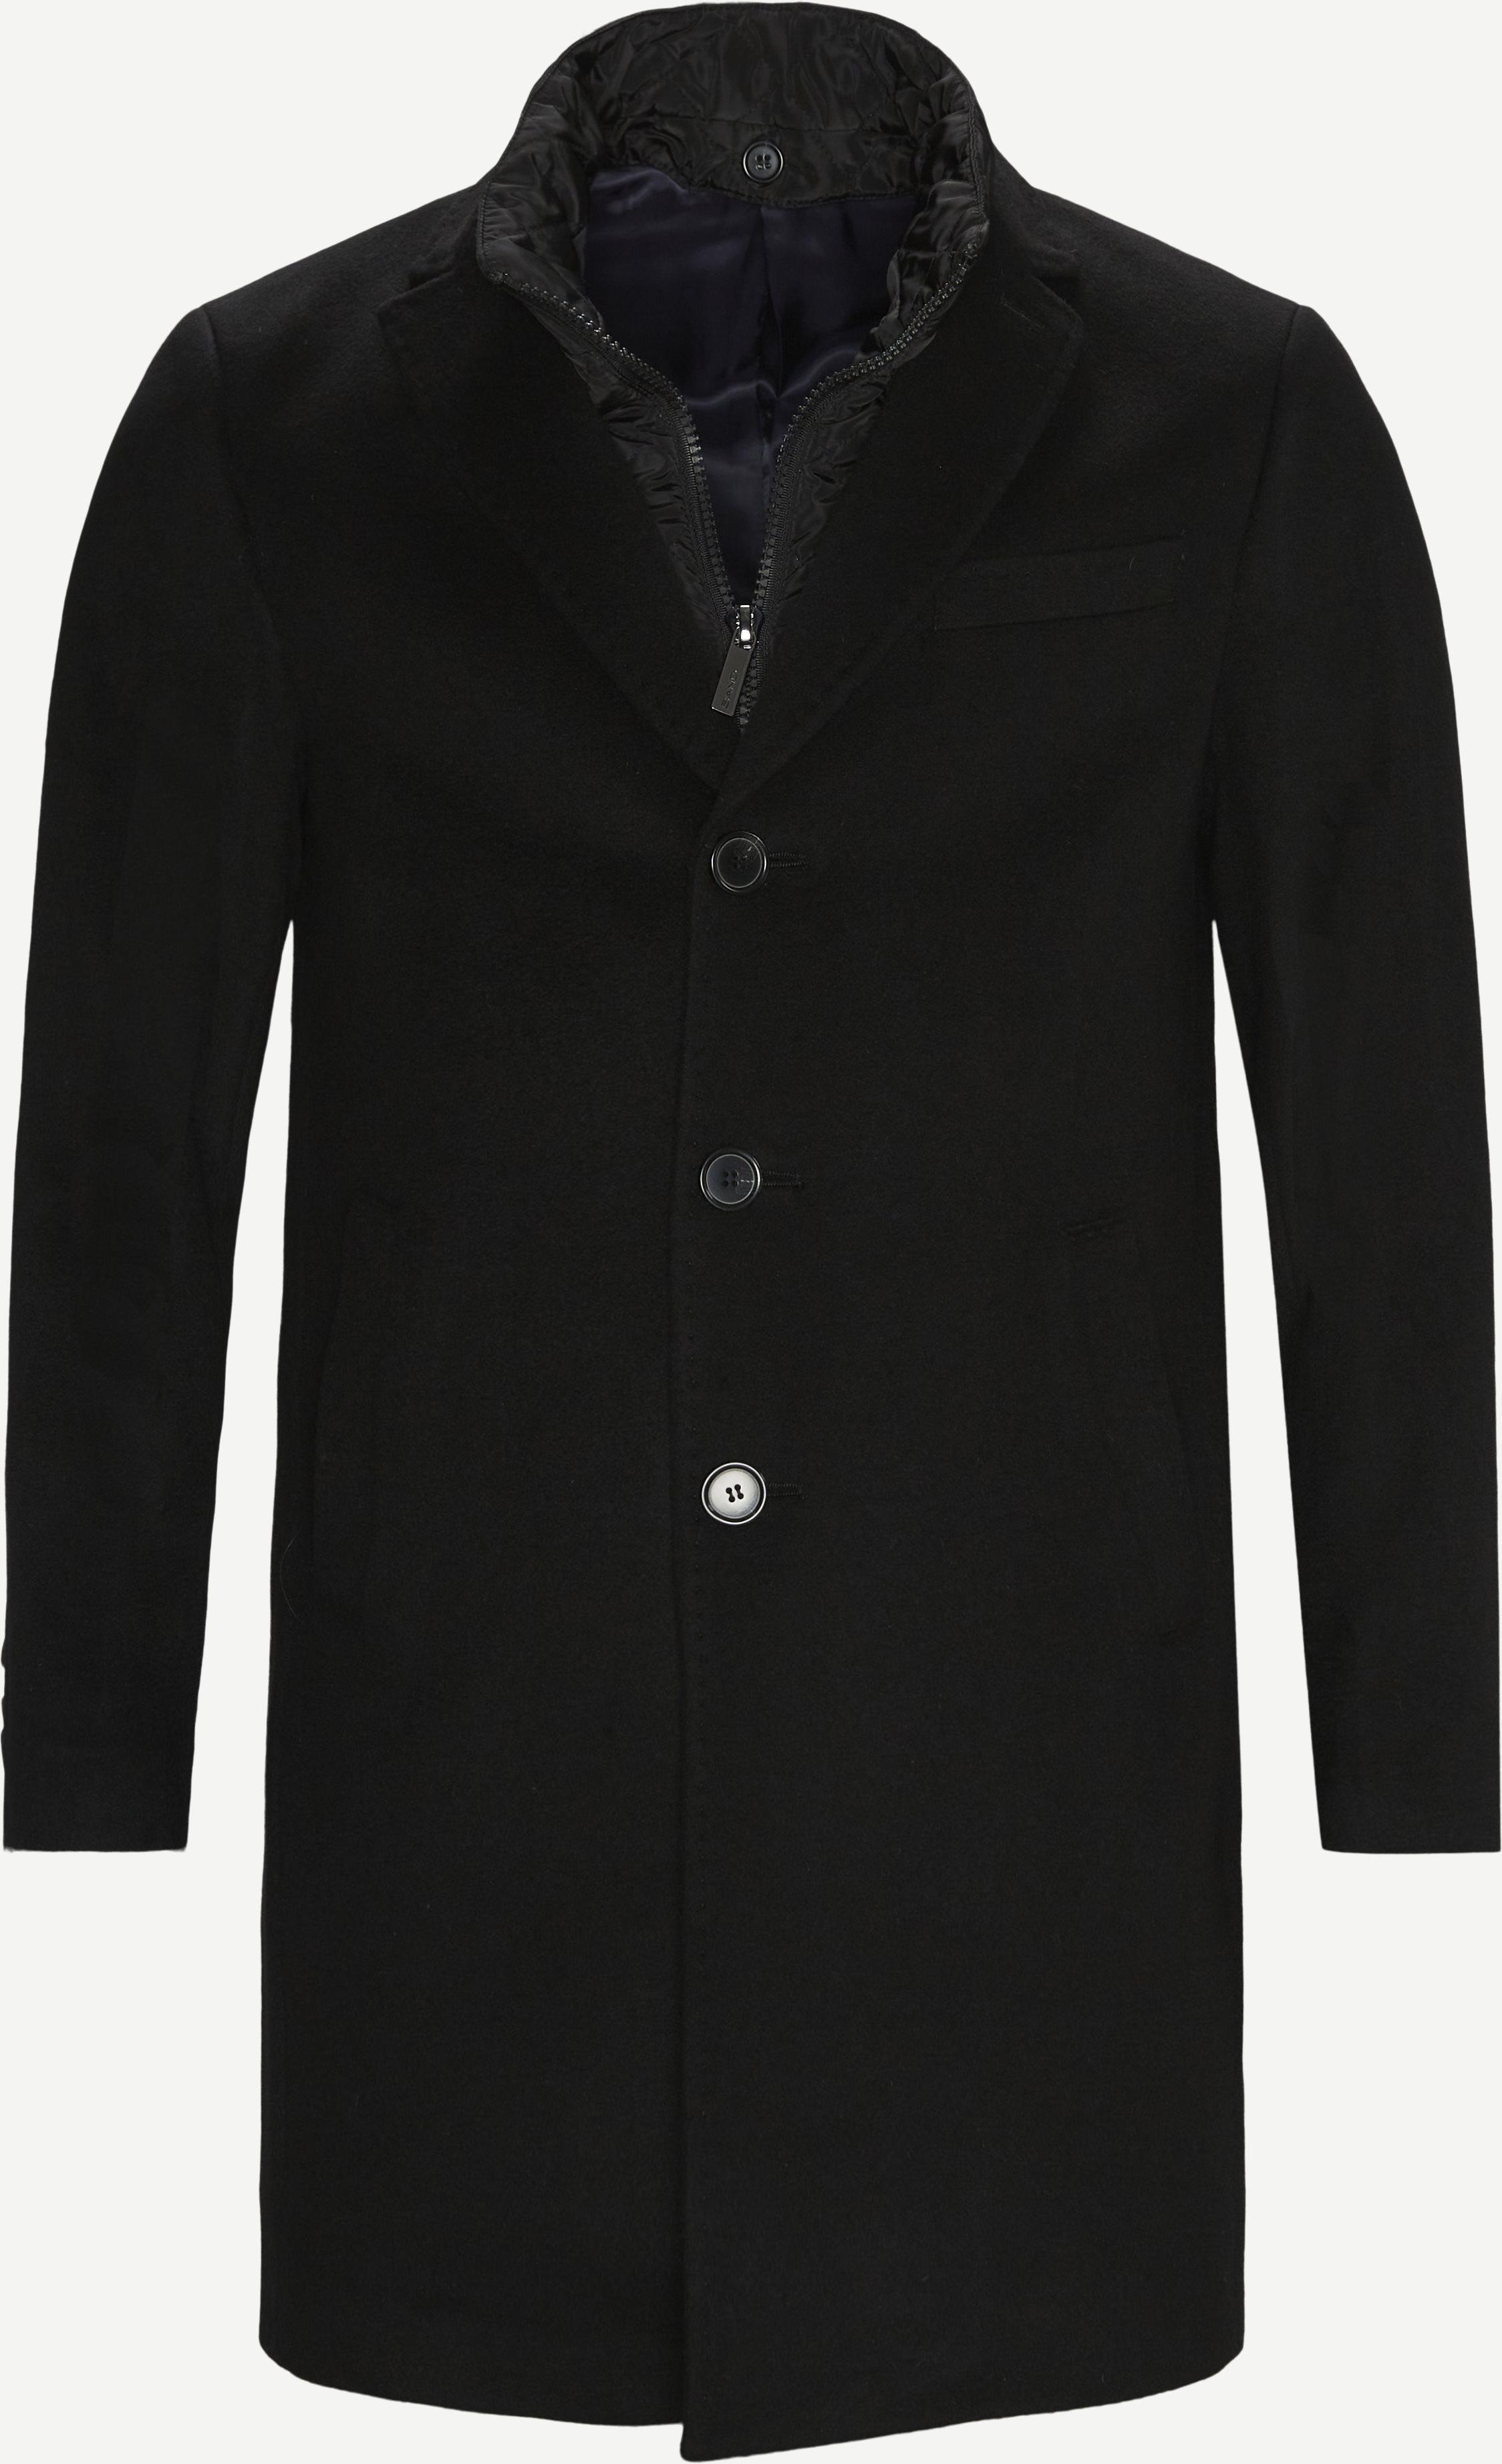 Cashmere Coat Sultan Tech - Jackor - Regular fit - Svart